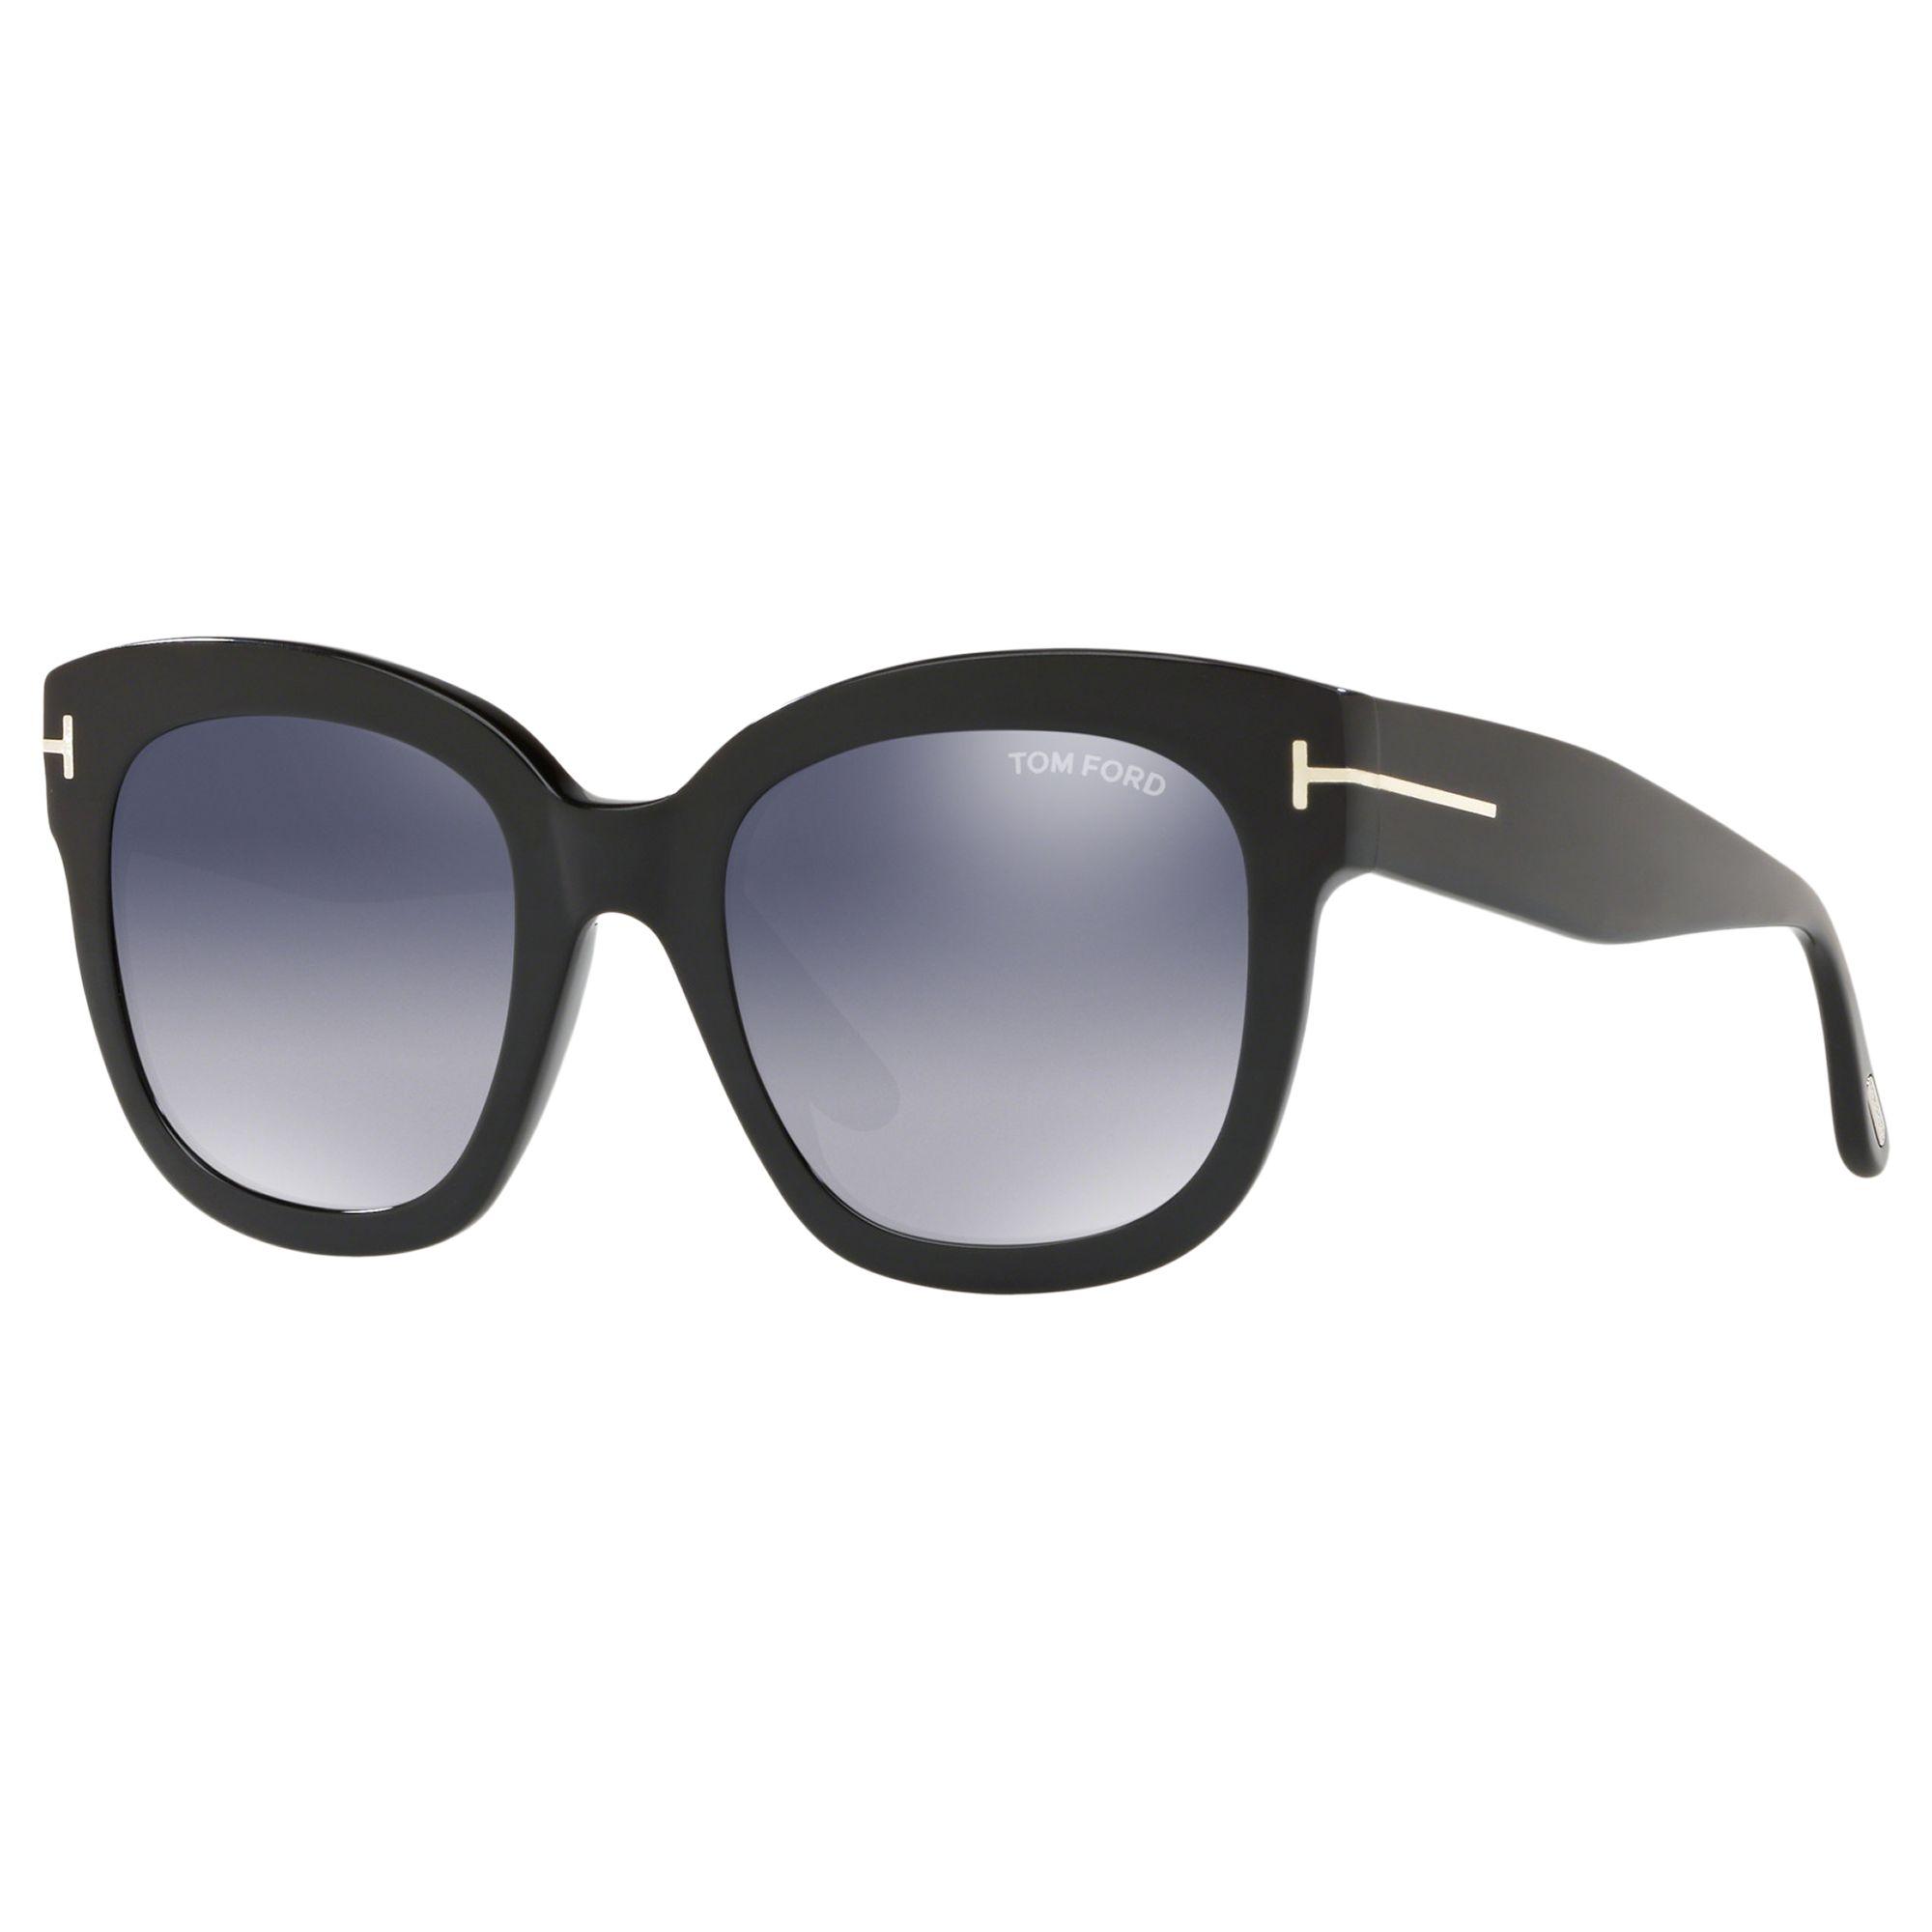 Tom Ford TOM FORD FT0613 Women's Beatrix-02 Square Sunglasses, Matte Black/Mirror Grey